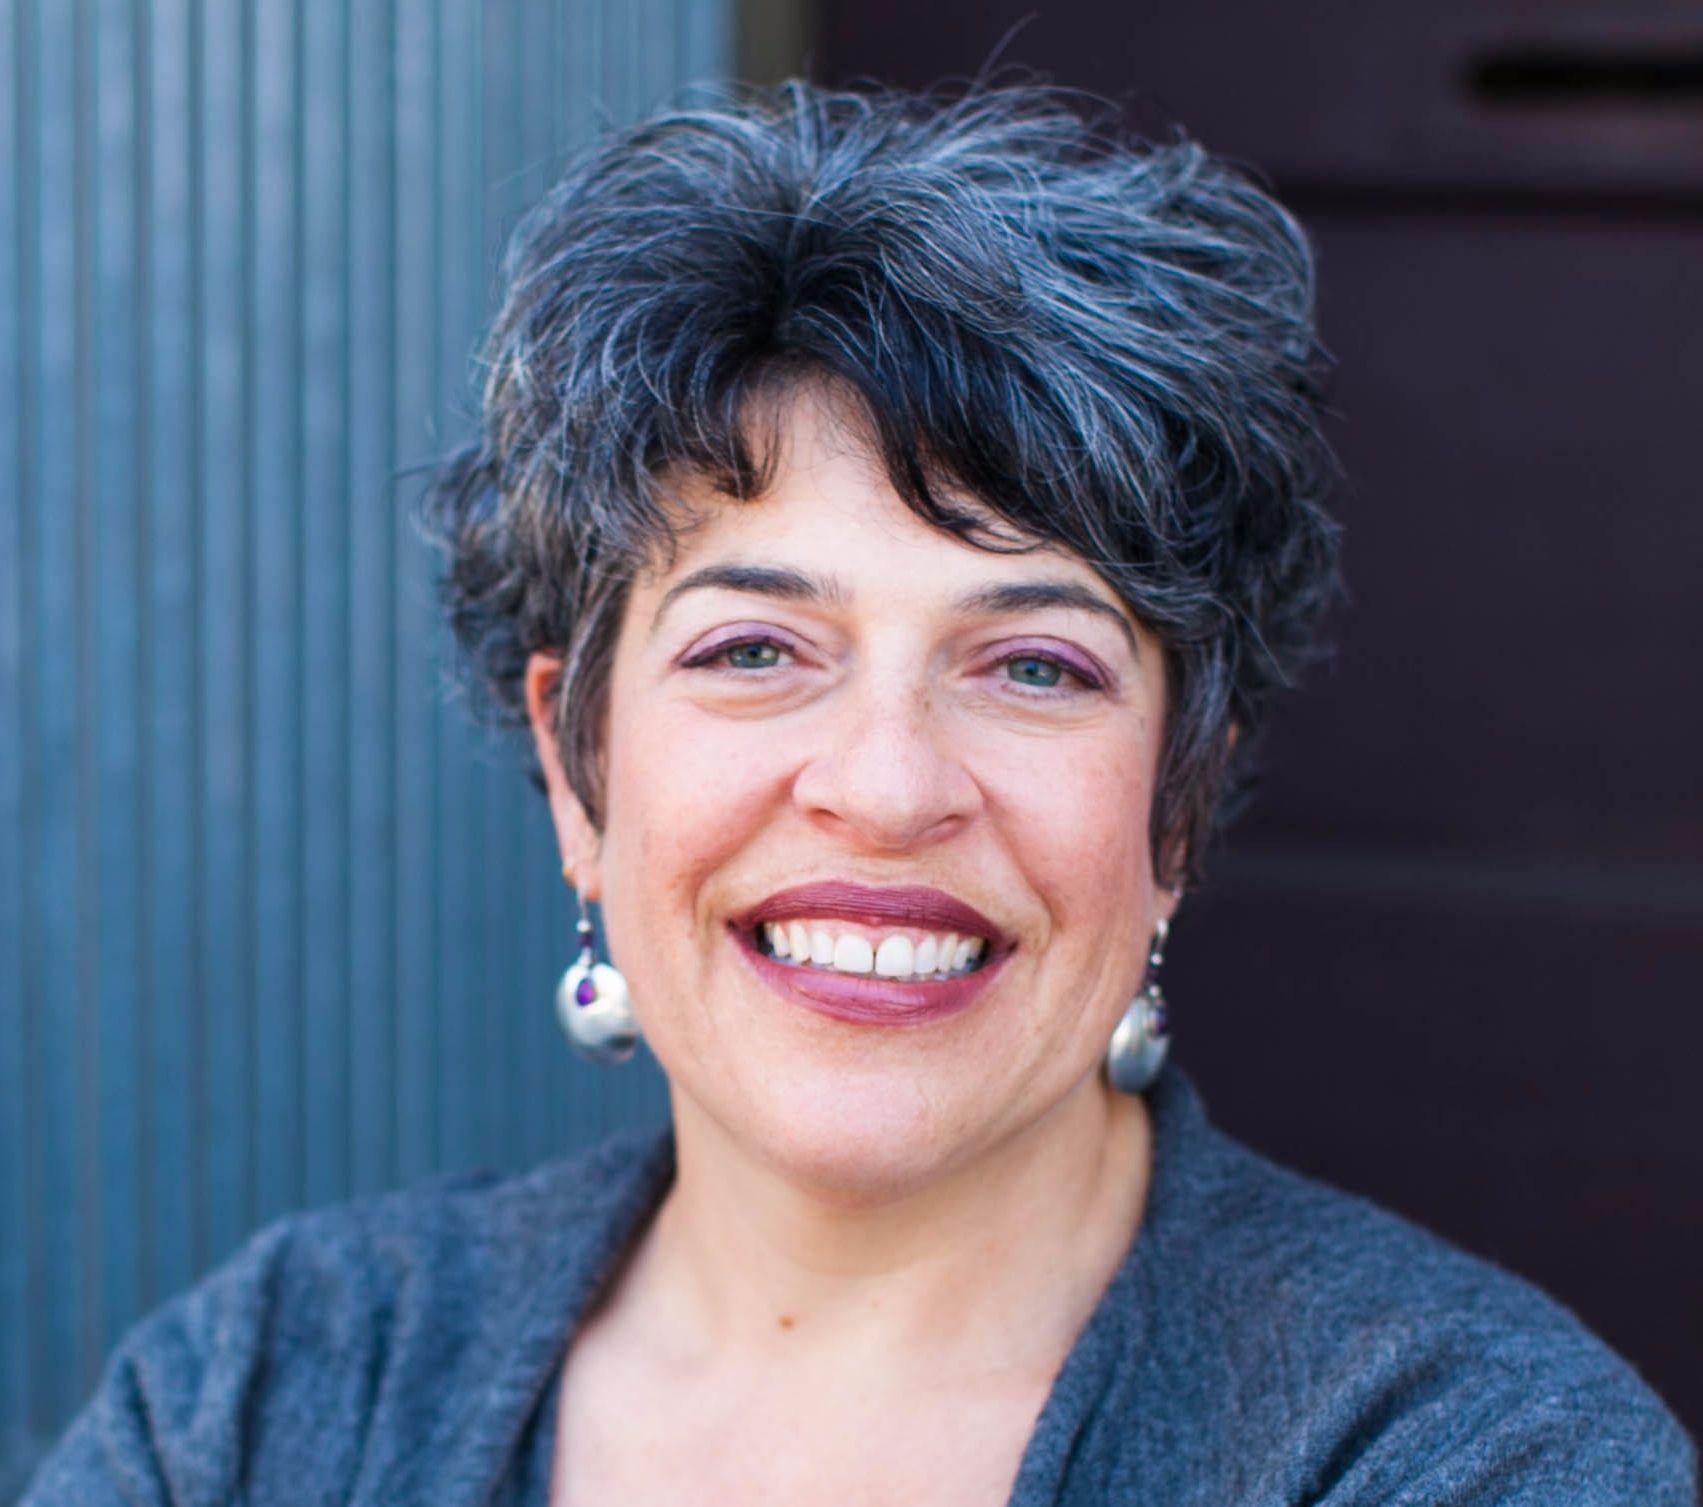 Karen Lee Erlichman